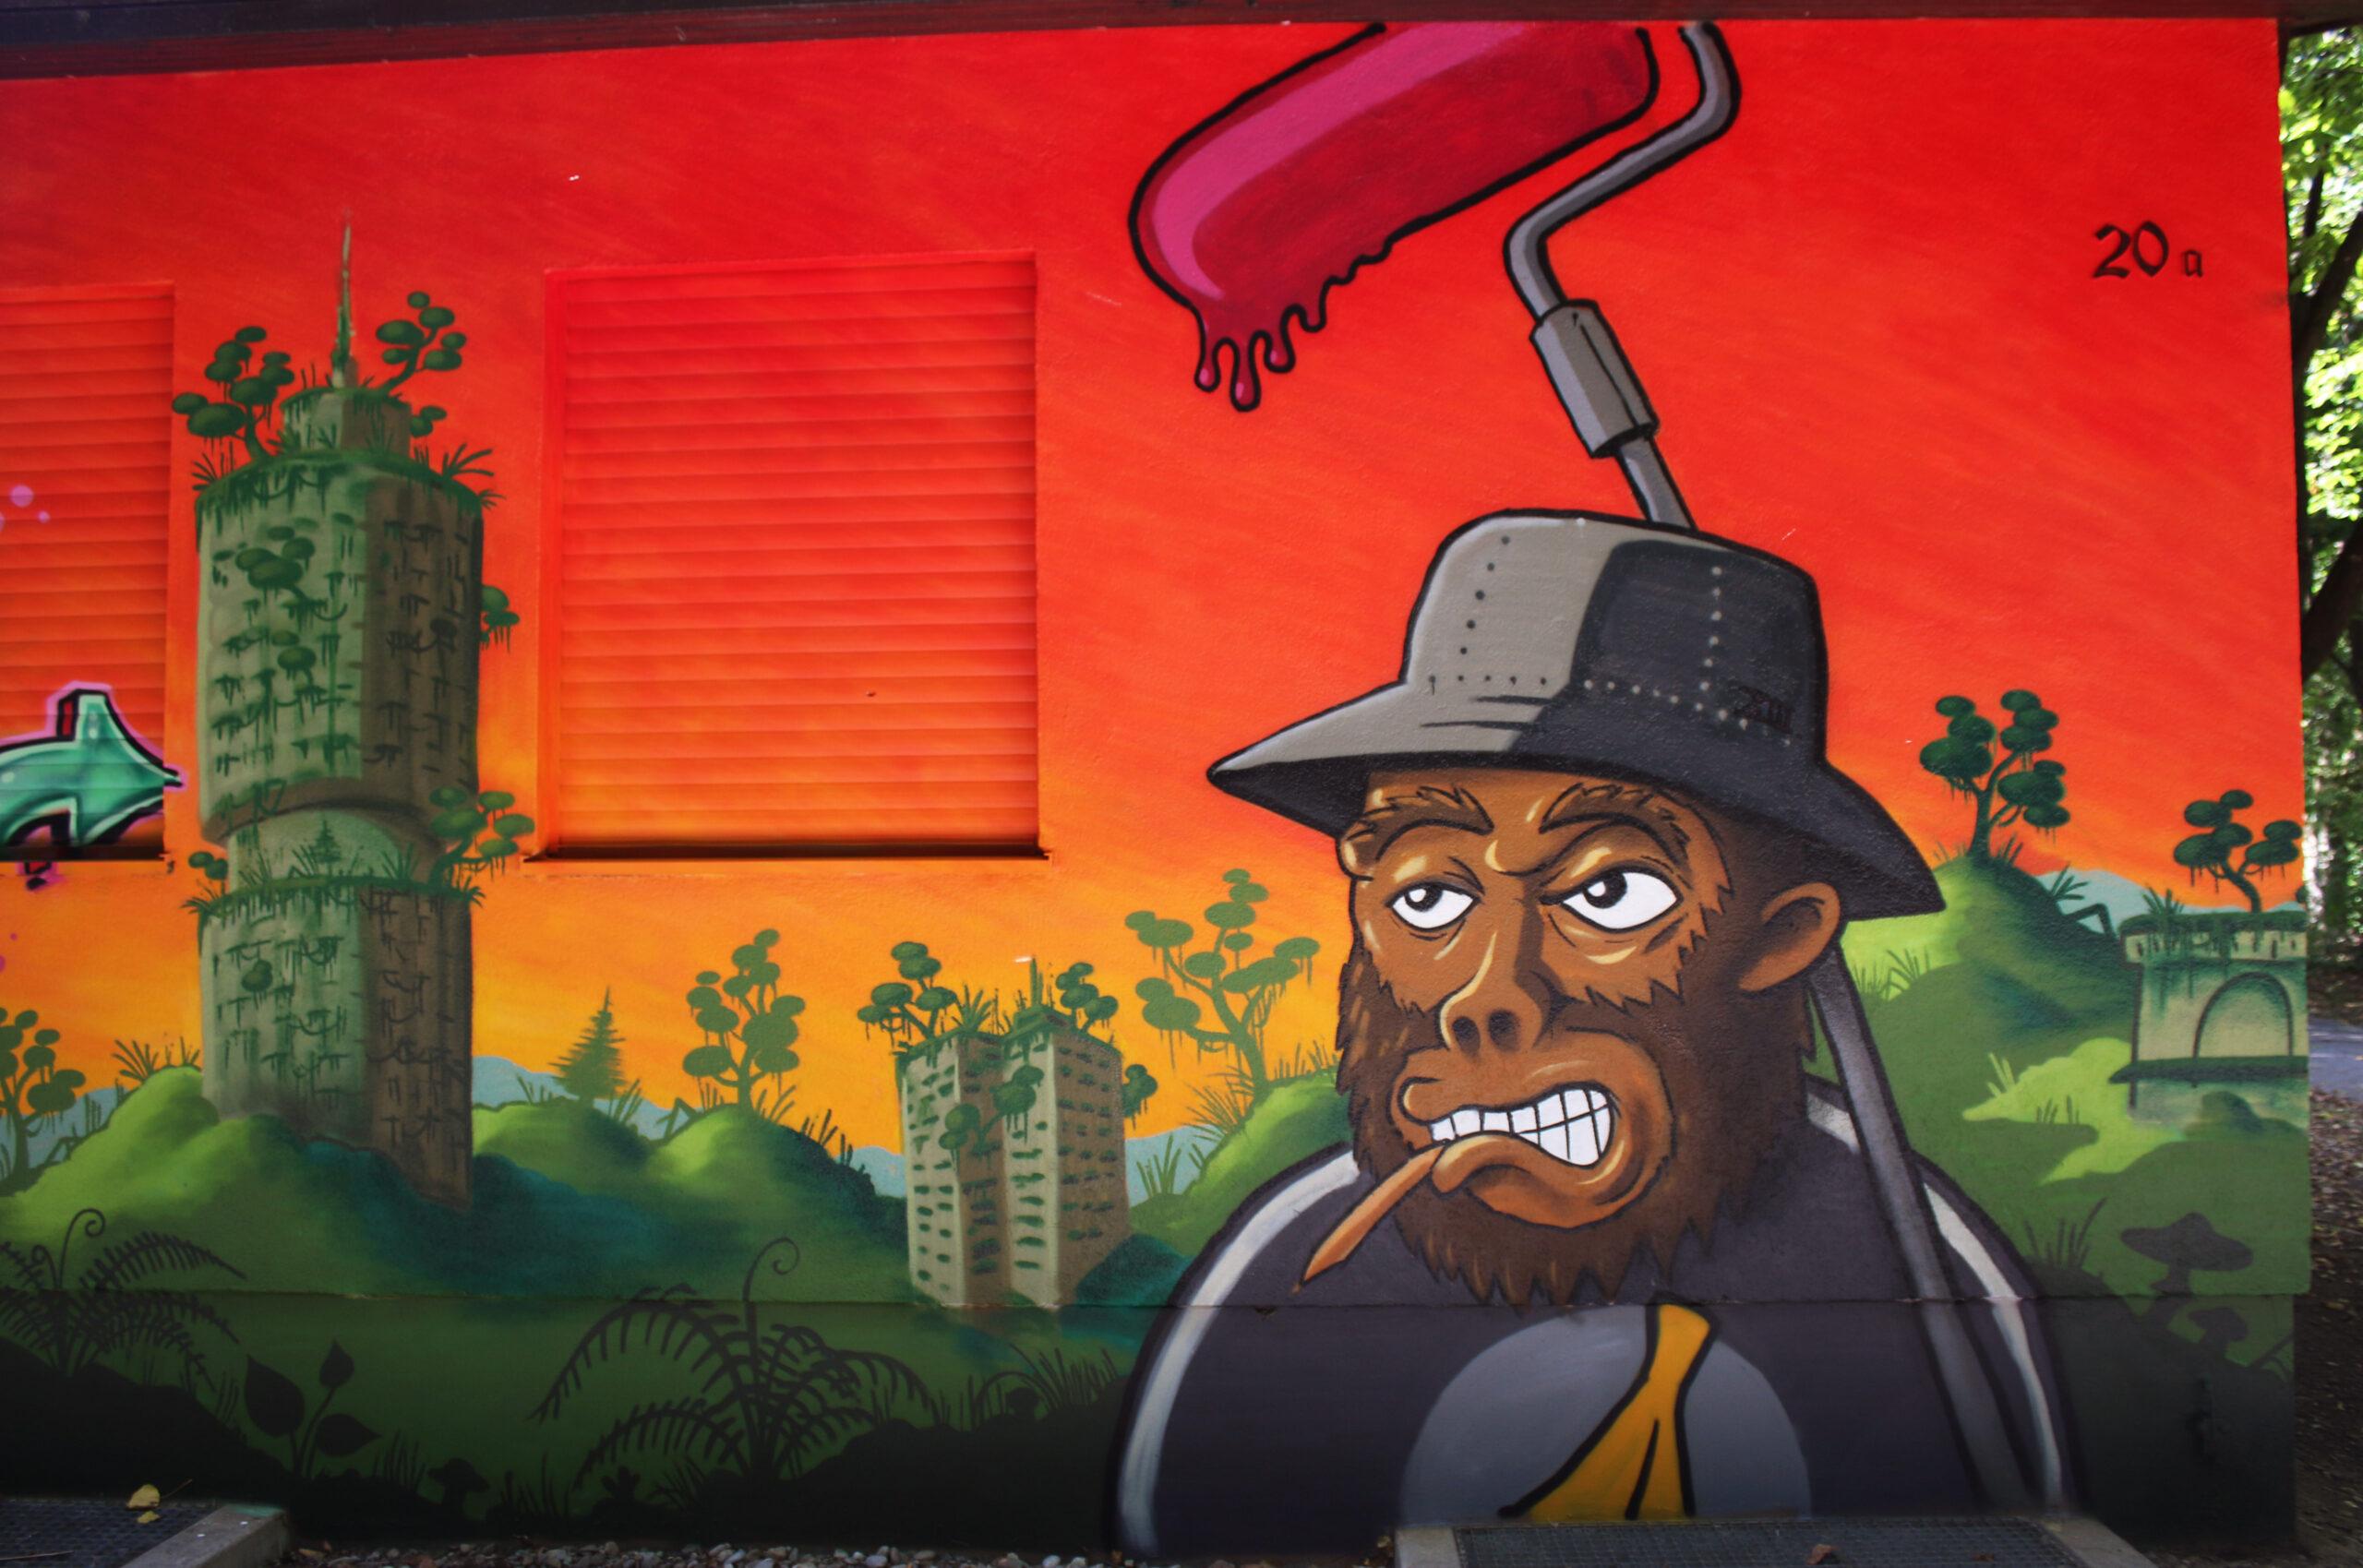 lou zeh louzeh monkey character roller graffiti jungle banana fisherhat hotelturm hotel tower dschungel